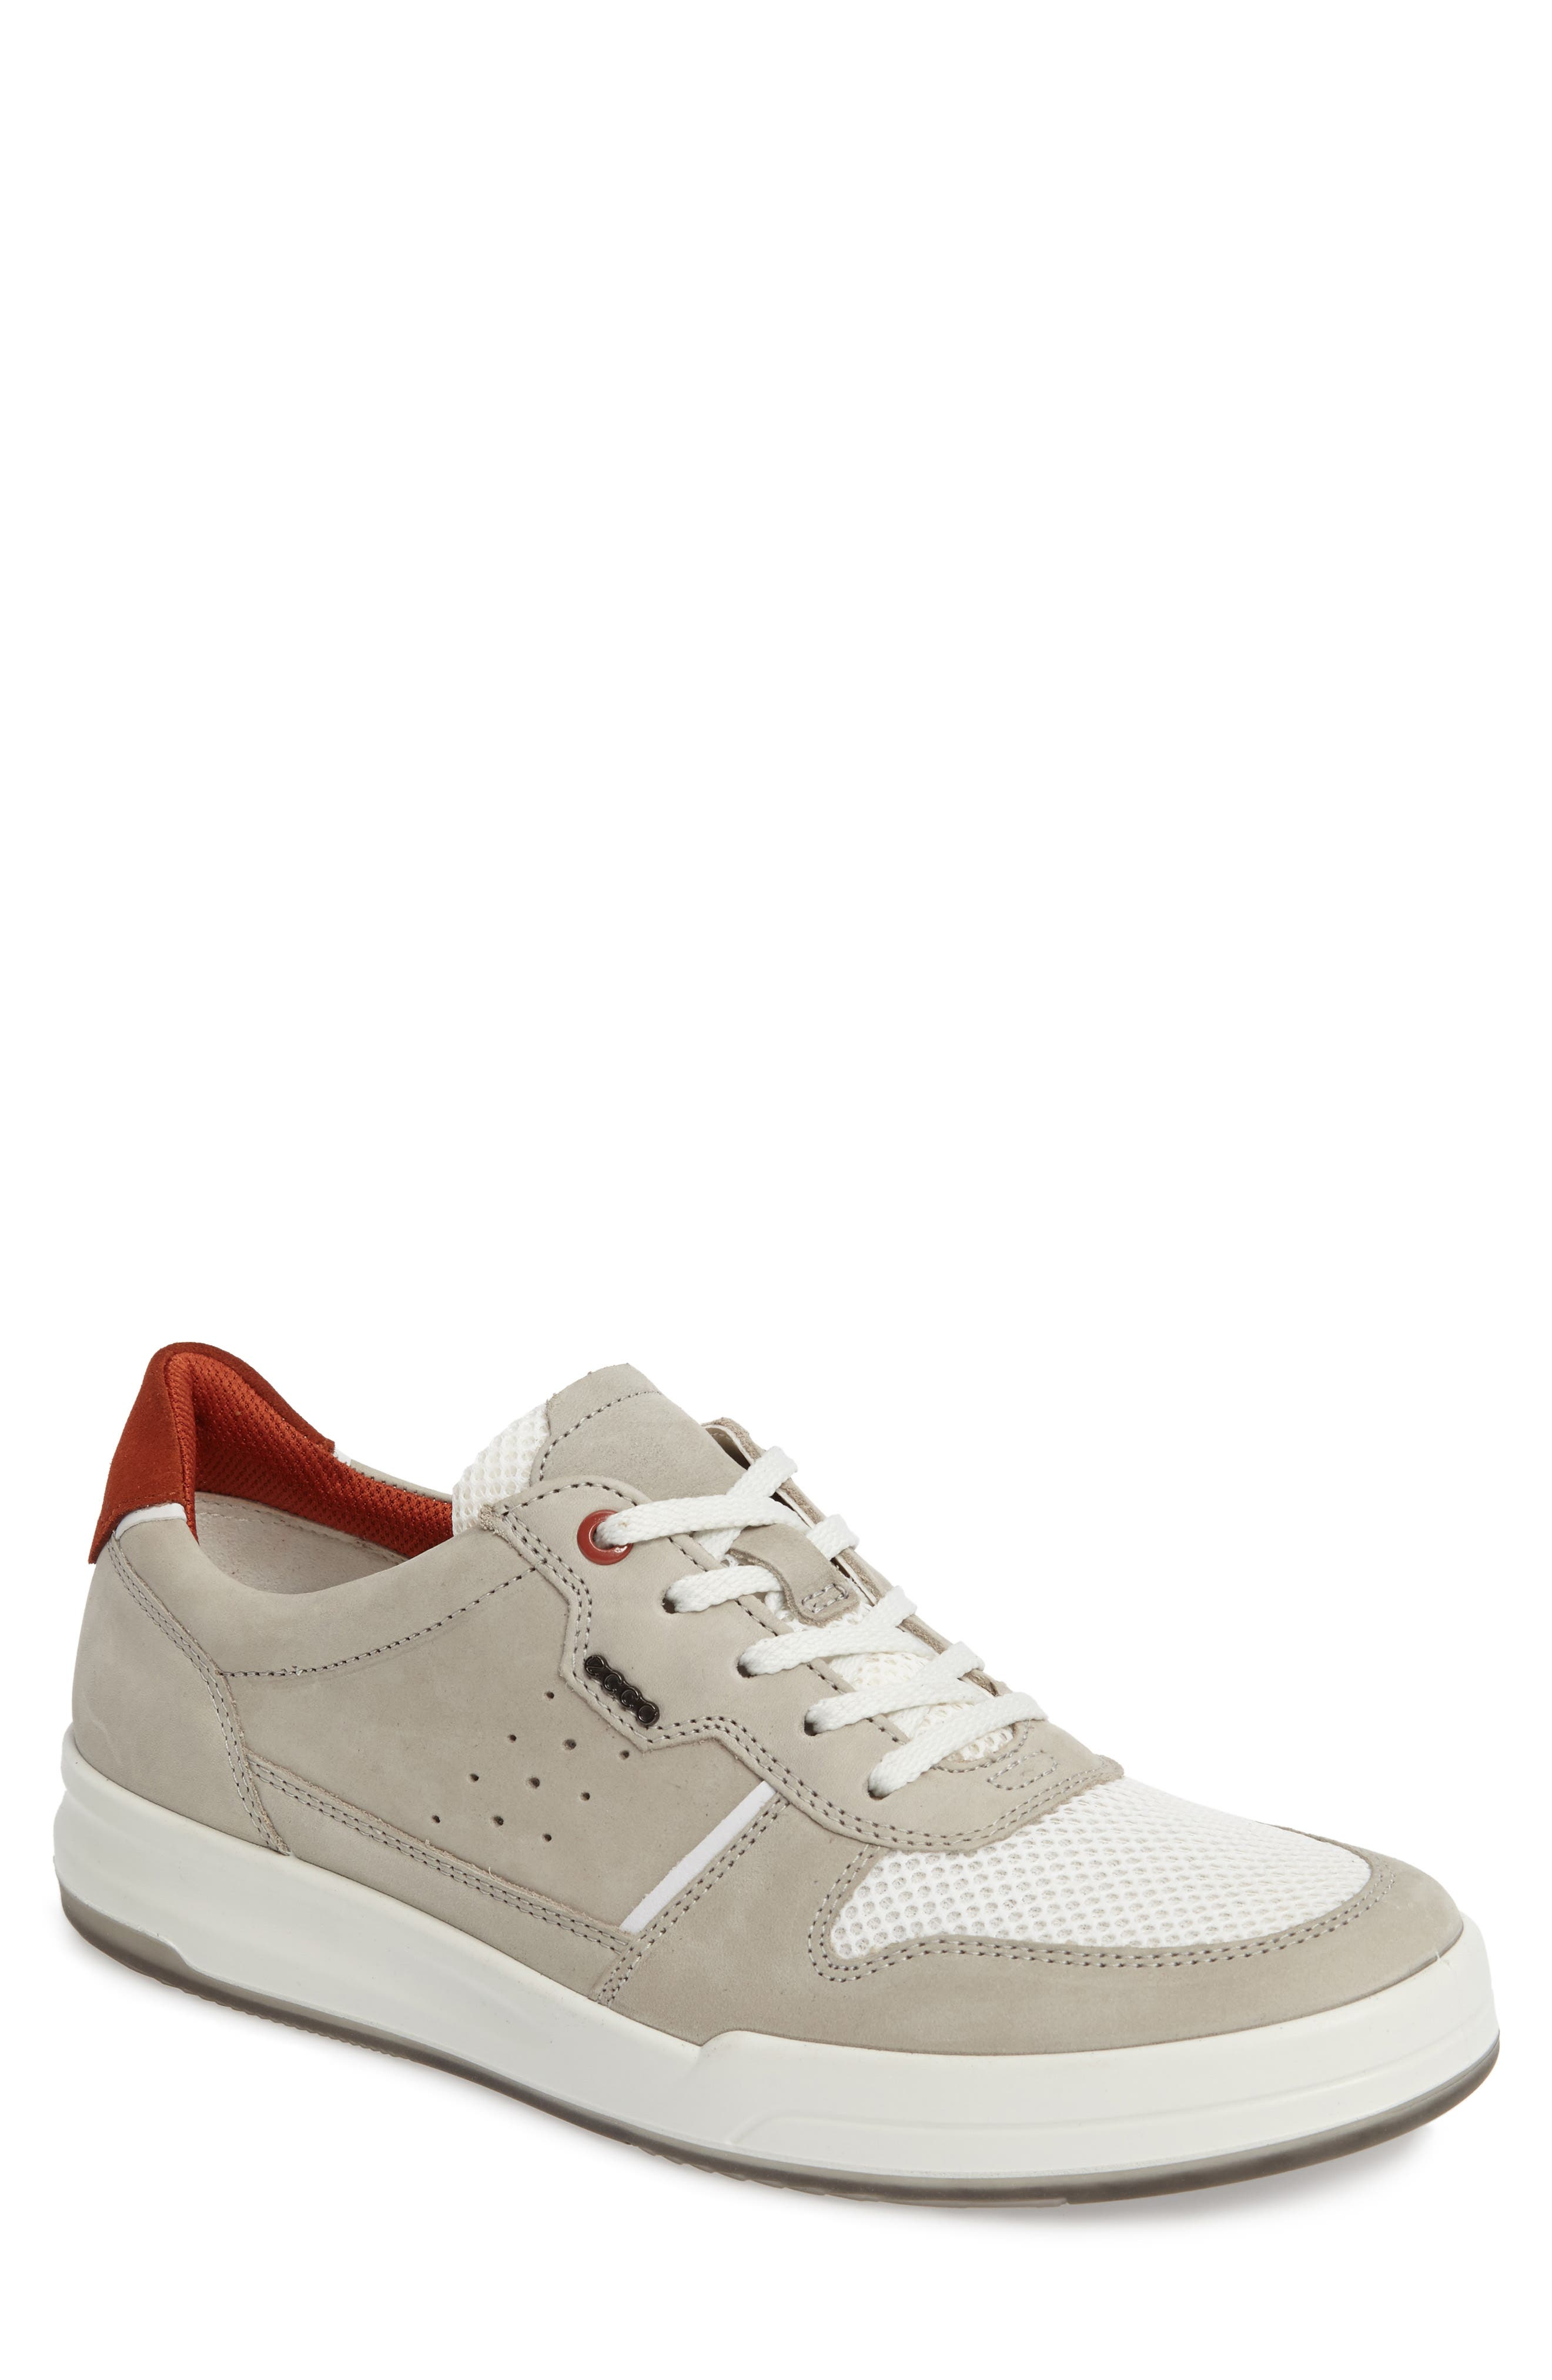 Jack Sneaker,                             Main thumbnail 1, color,                             053